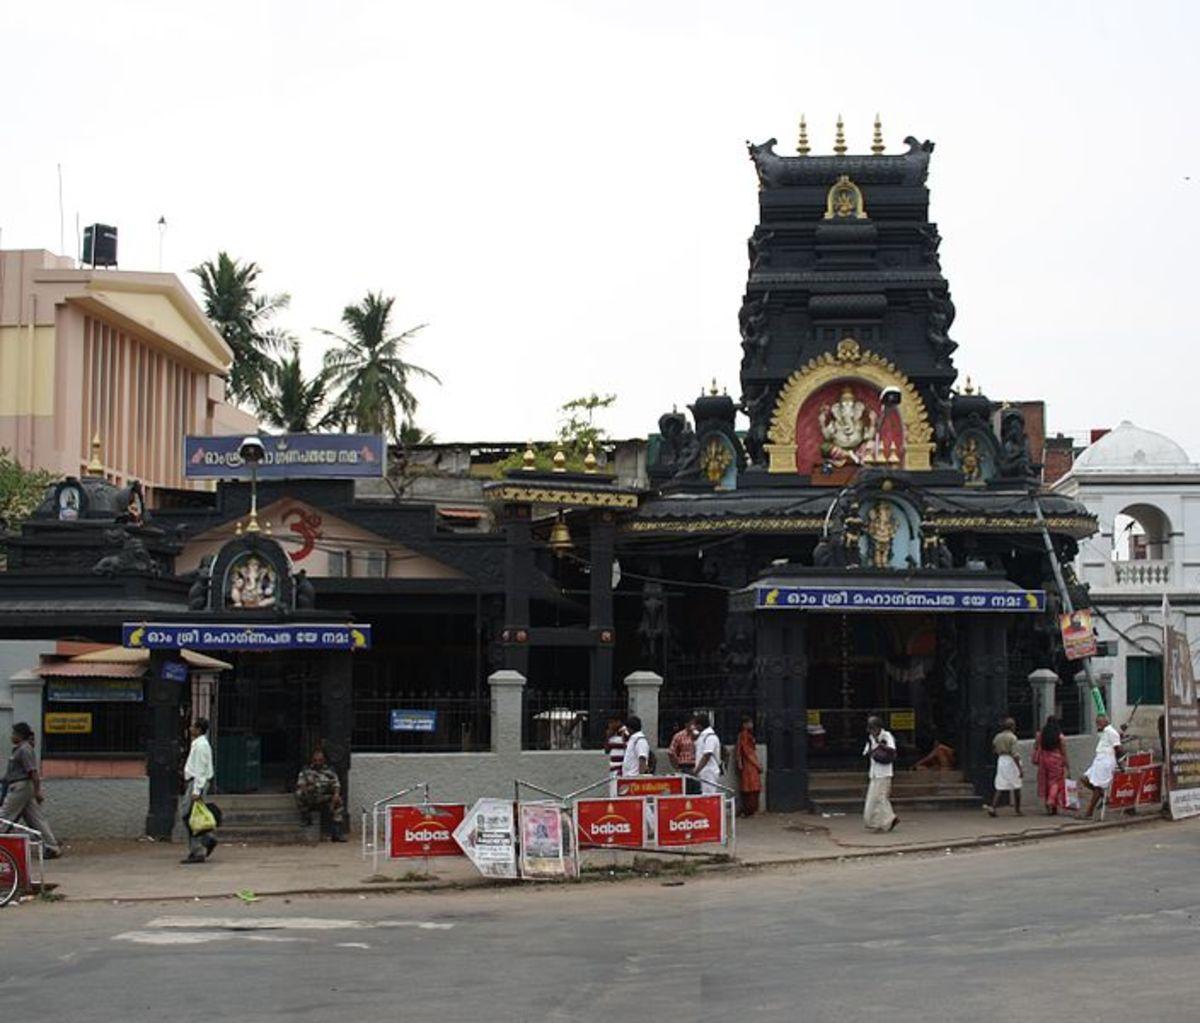 Templo Pazhavangadi Ganapati, Thiruvananthapuram- el más famoso templo de Ganapati en Kerala.